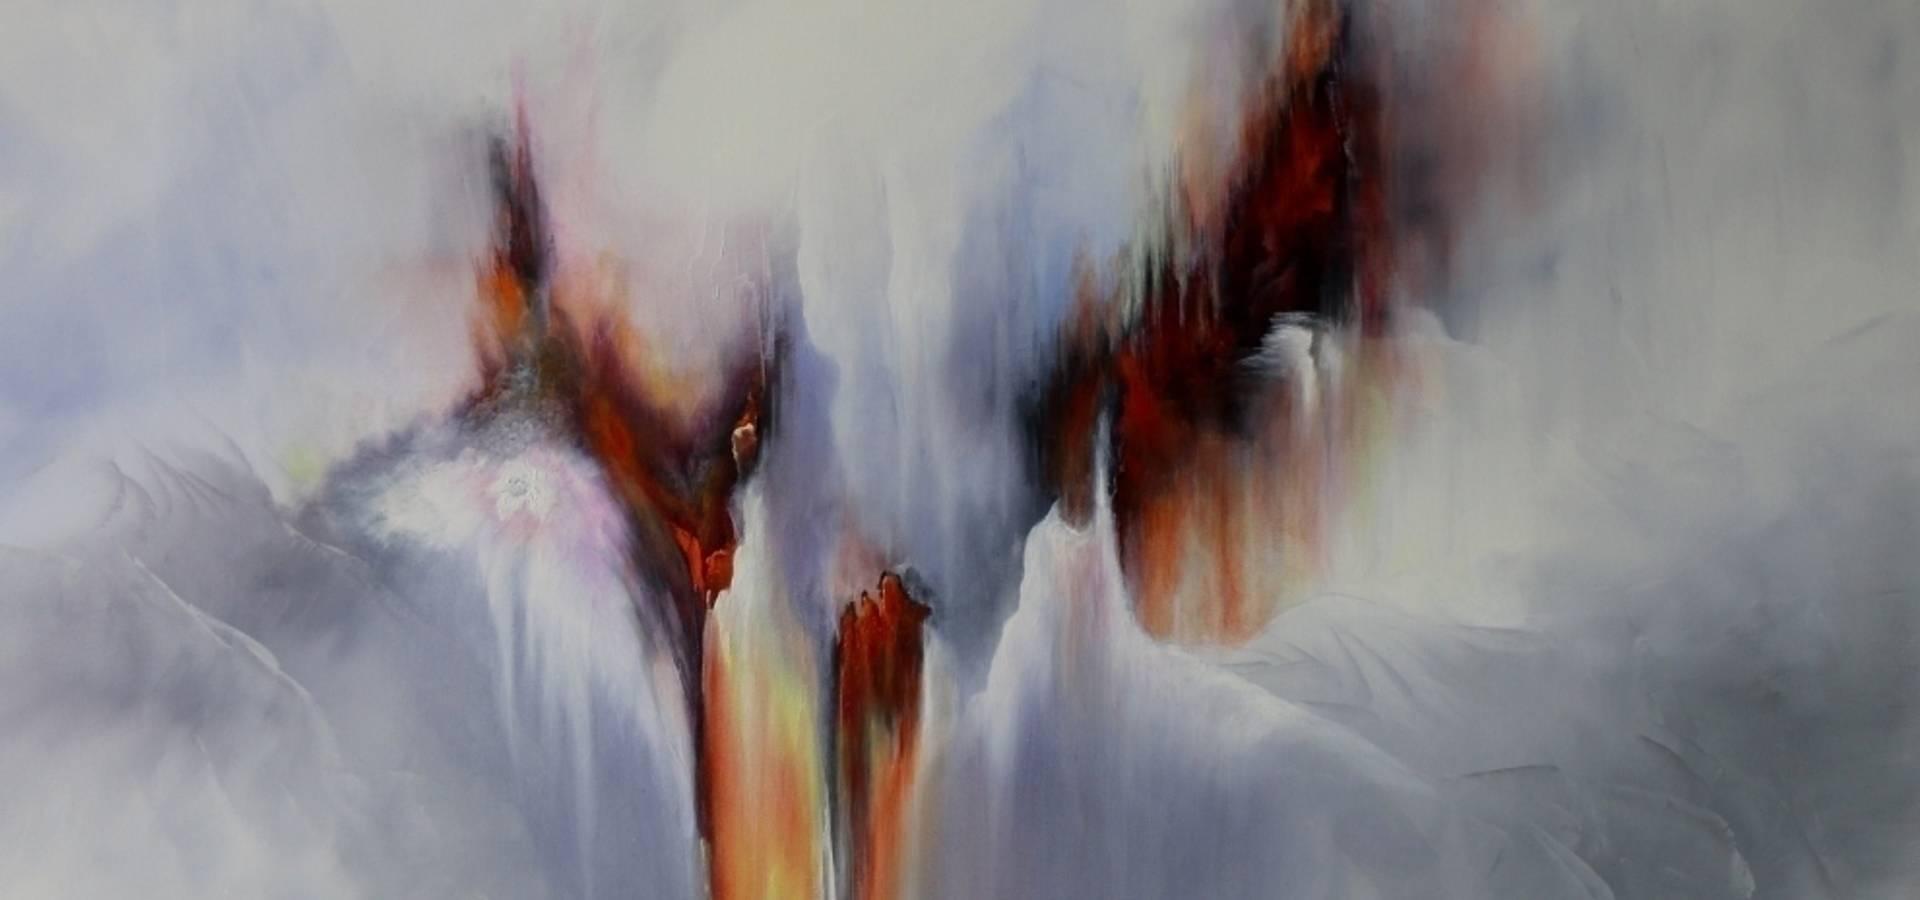 Atelier galerie de l 39 artiste peintre nadine bertulessi - Atelier artiste peintre ...